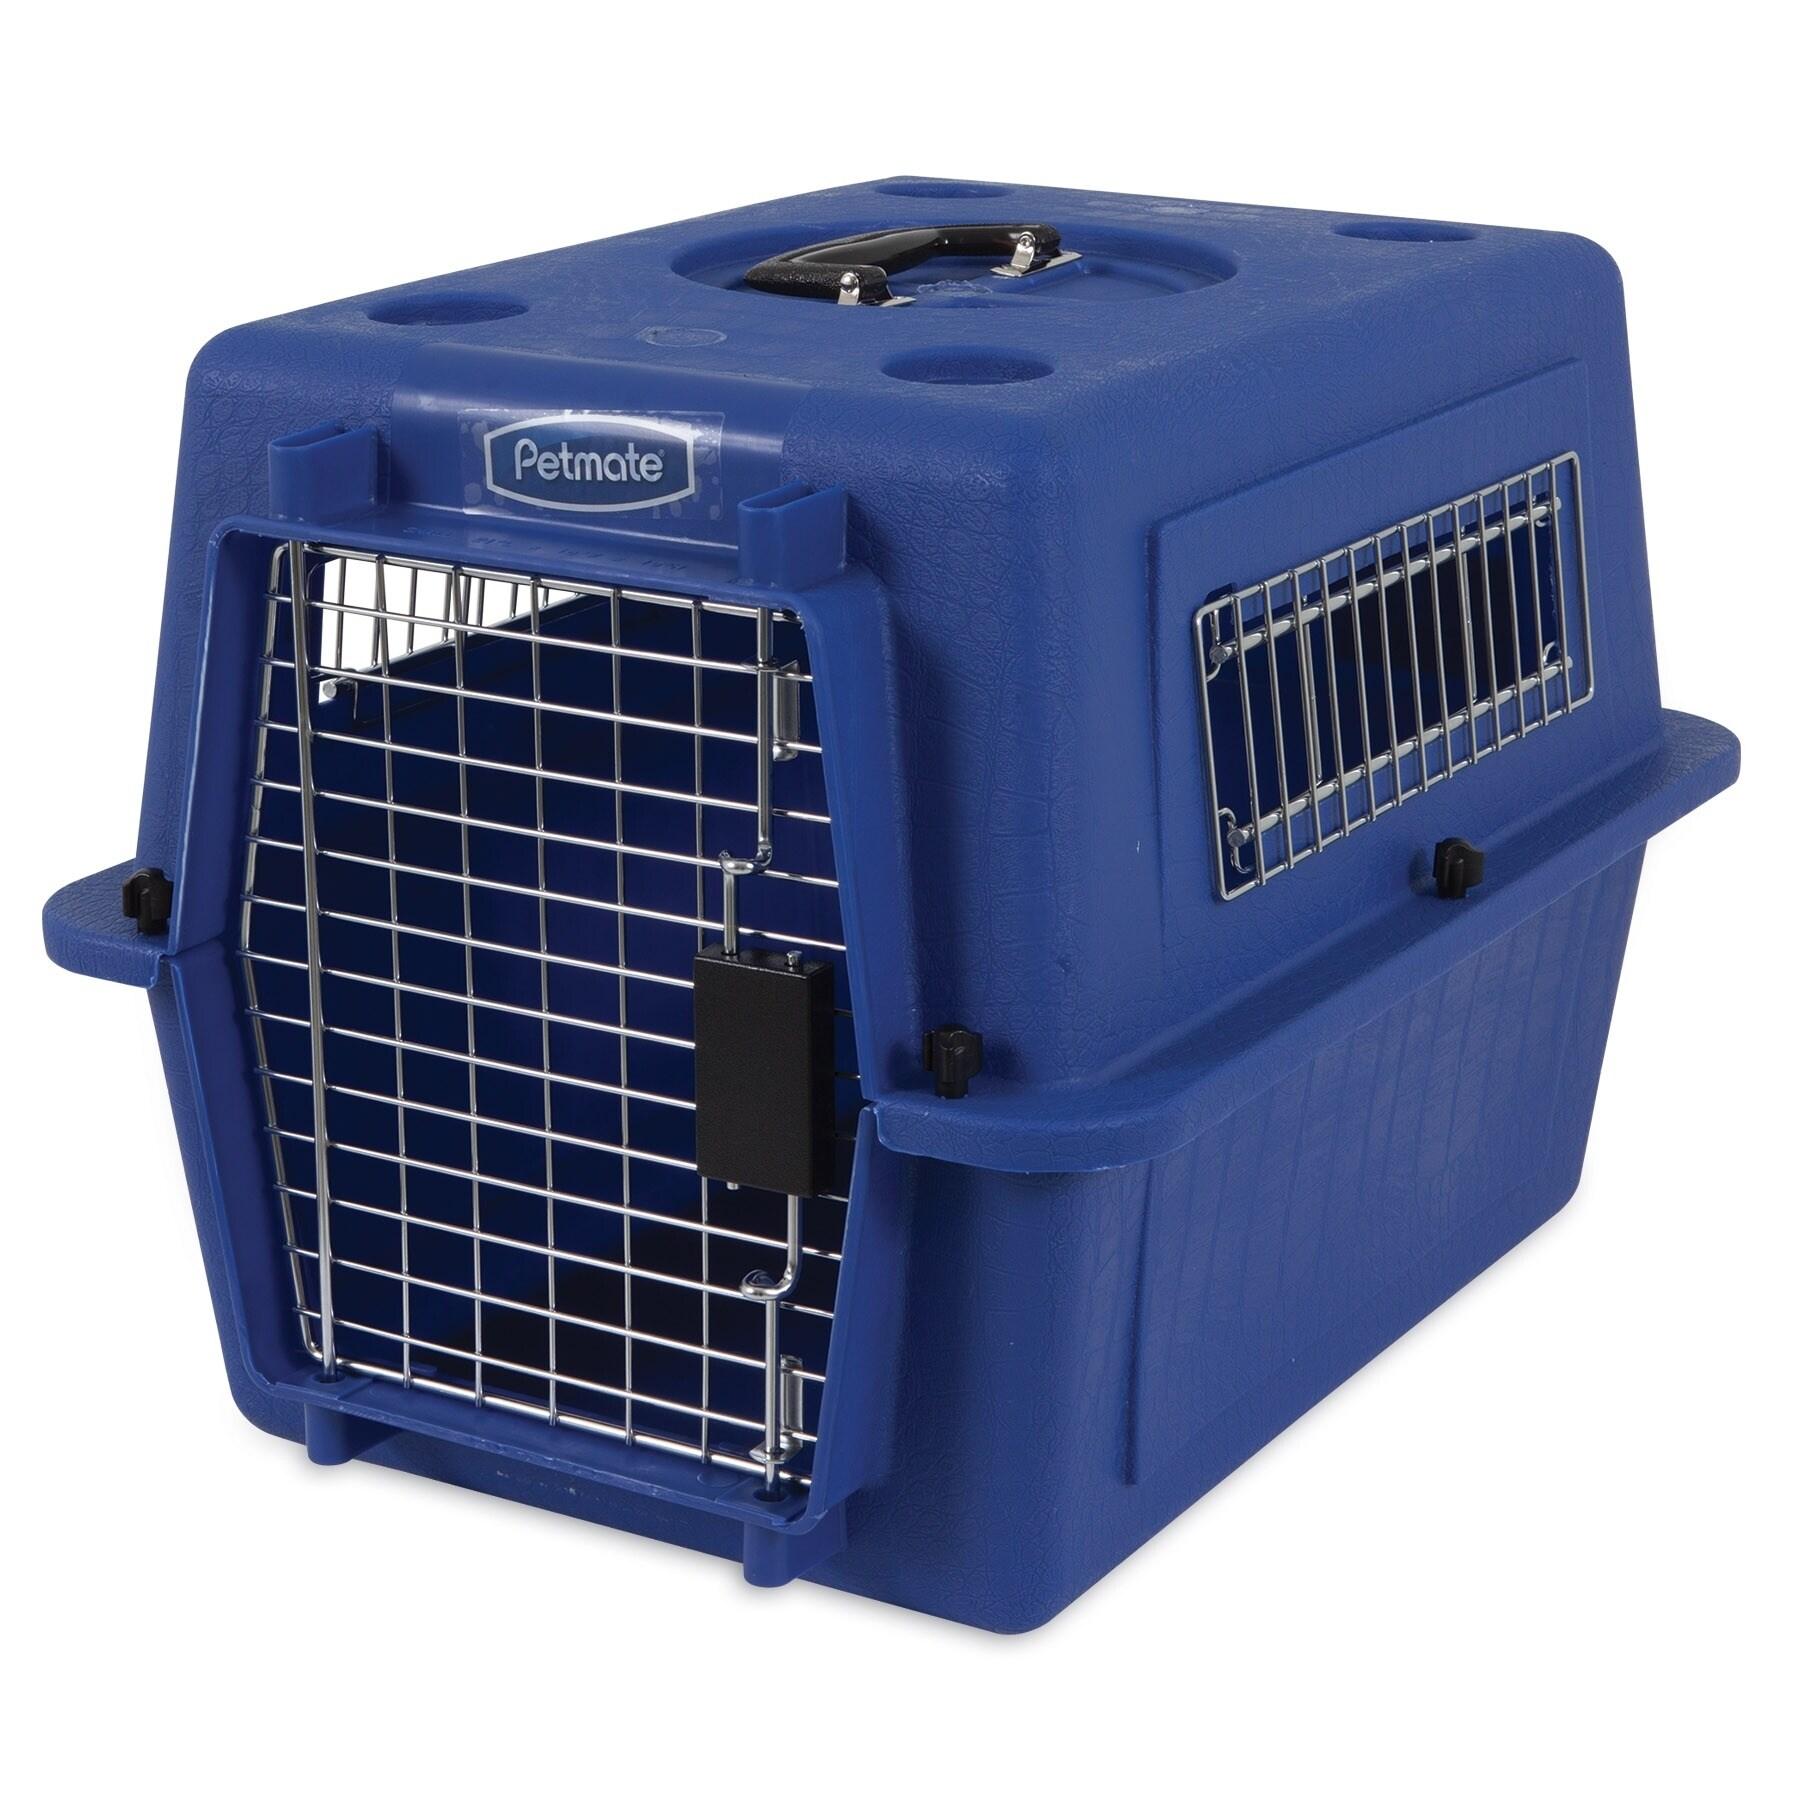 Petmate Ultra Vari Kennel, True Blue, Up to 15lbs (Blue)